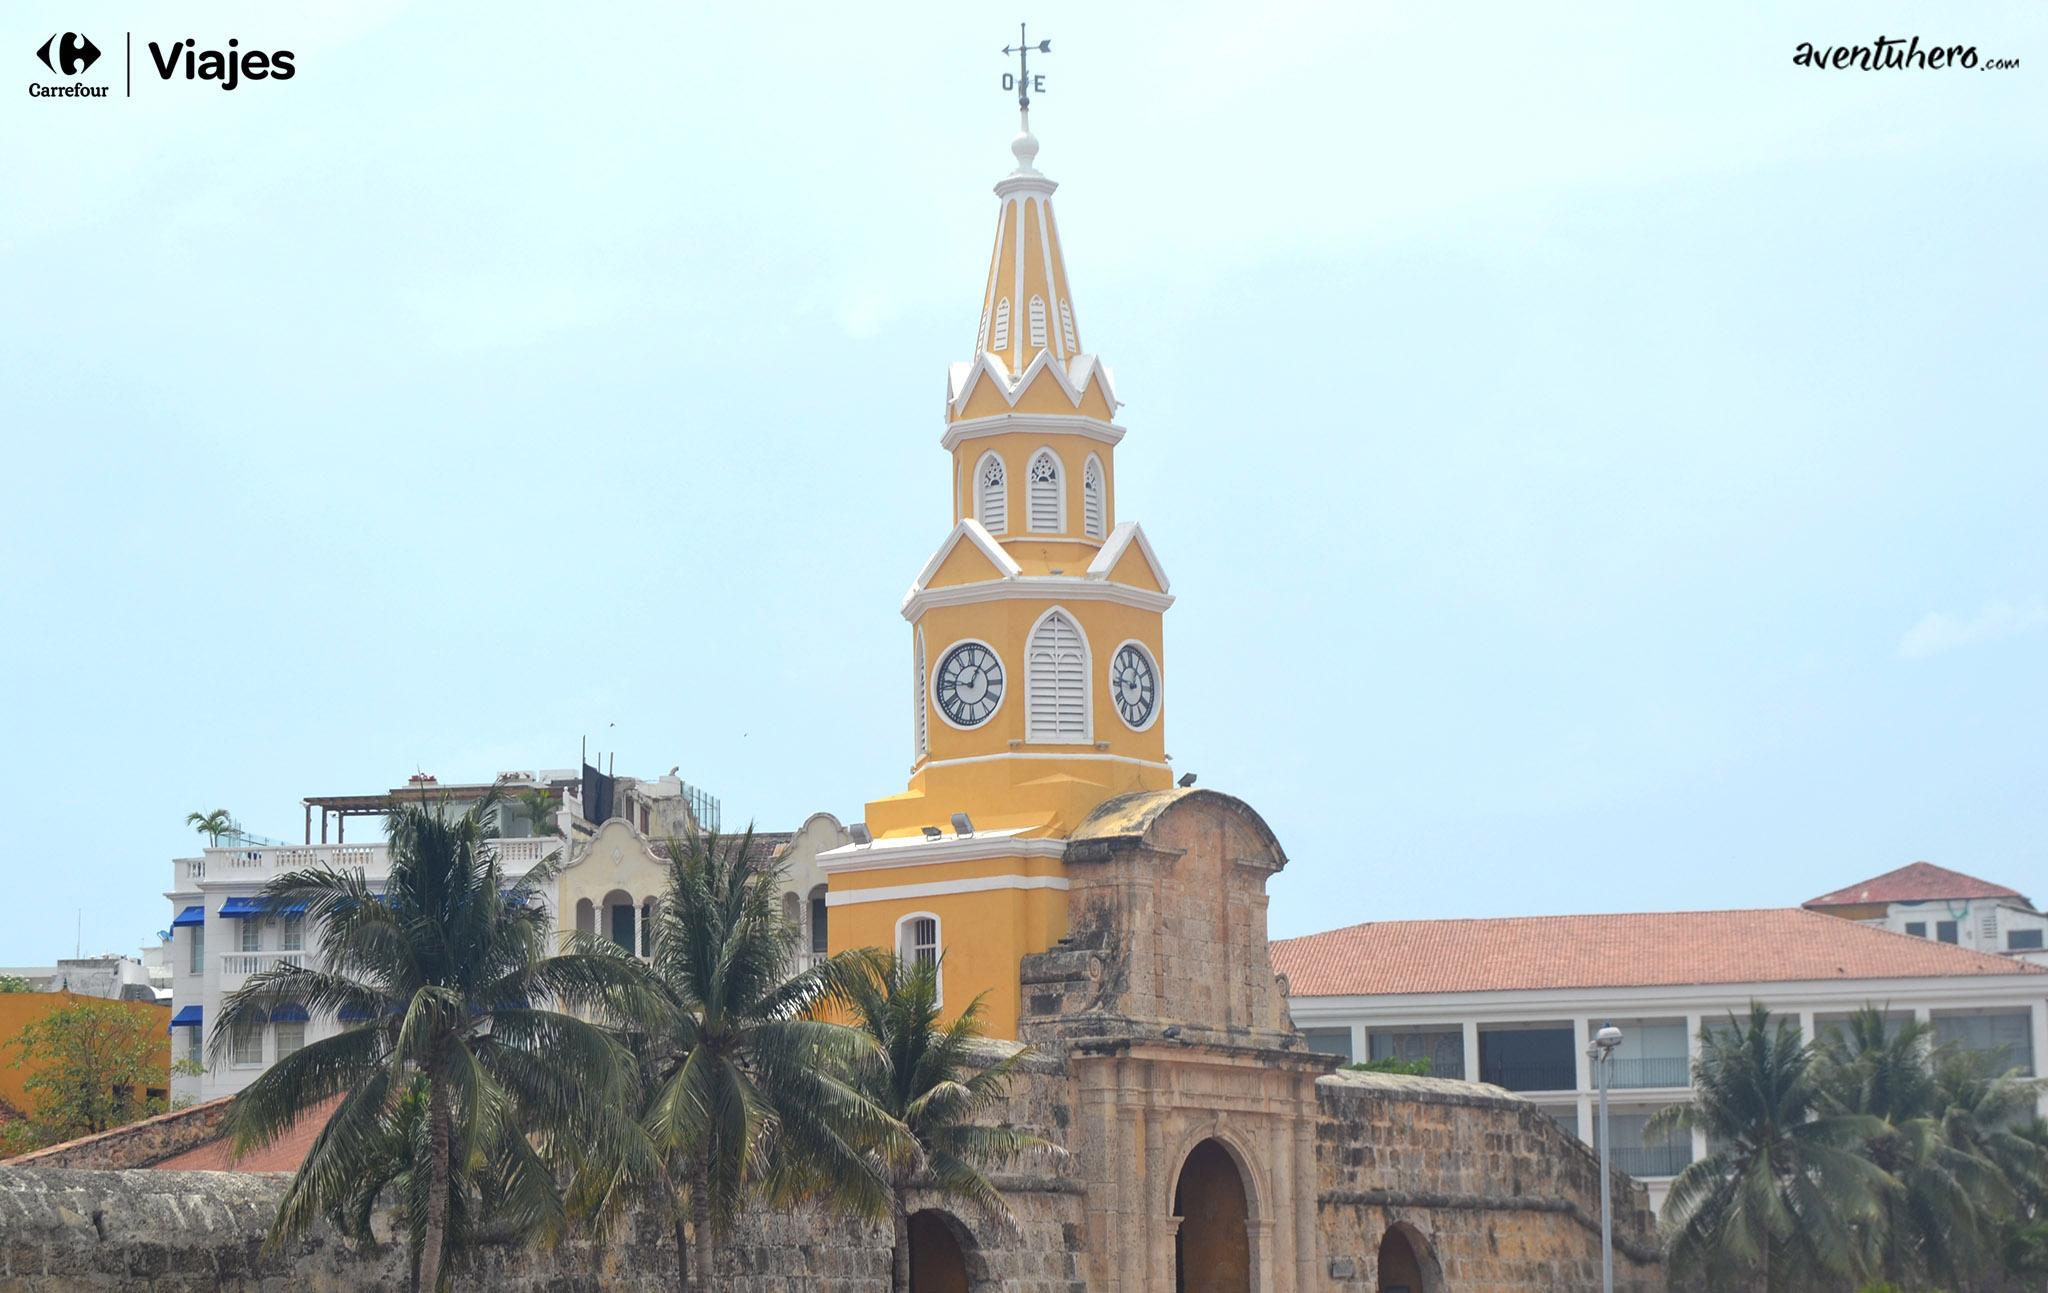 La torre del reloj